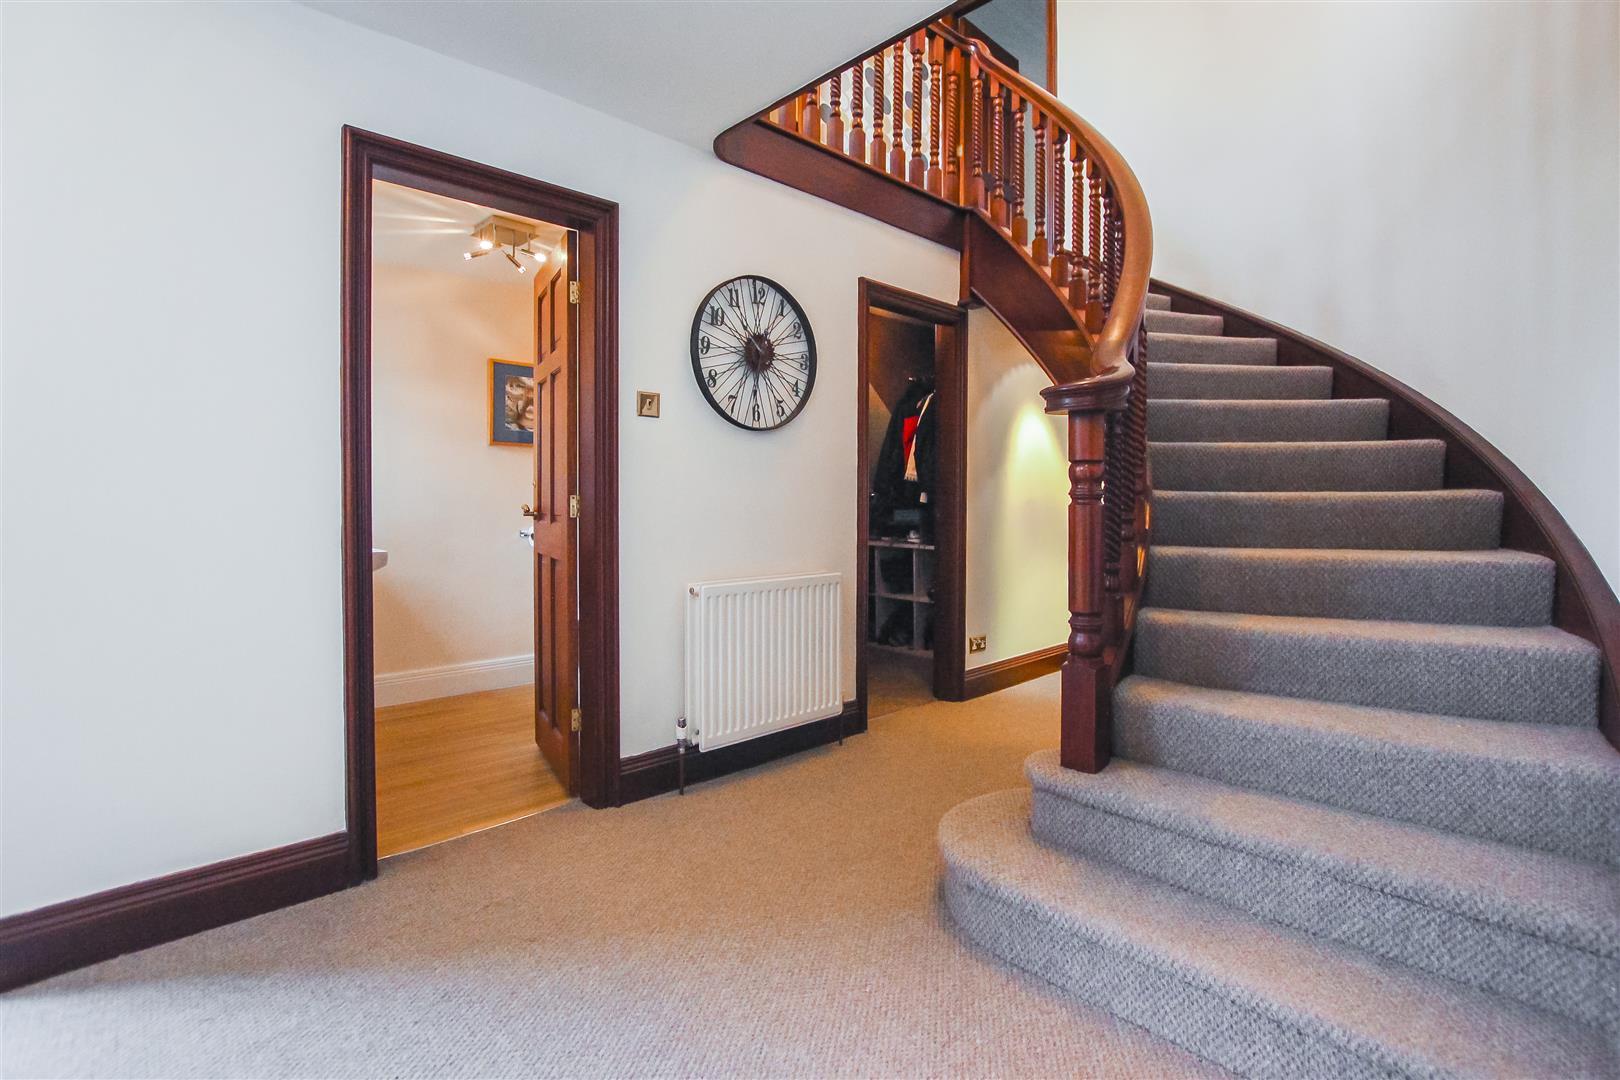 6 Bedroom Detached House For Sale - Entrance Hall